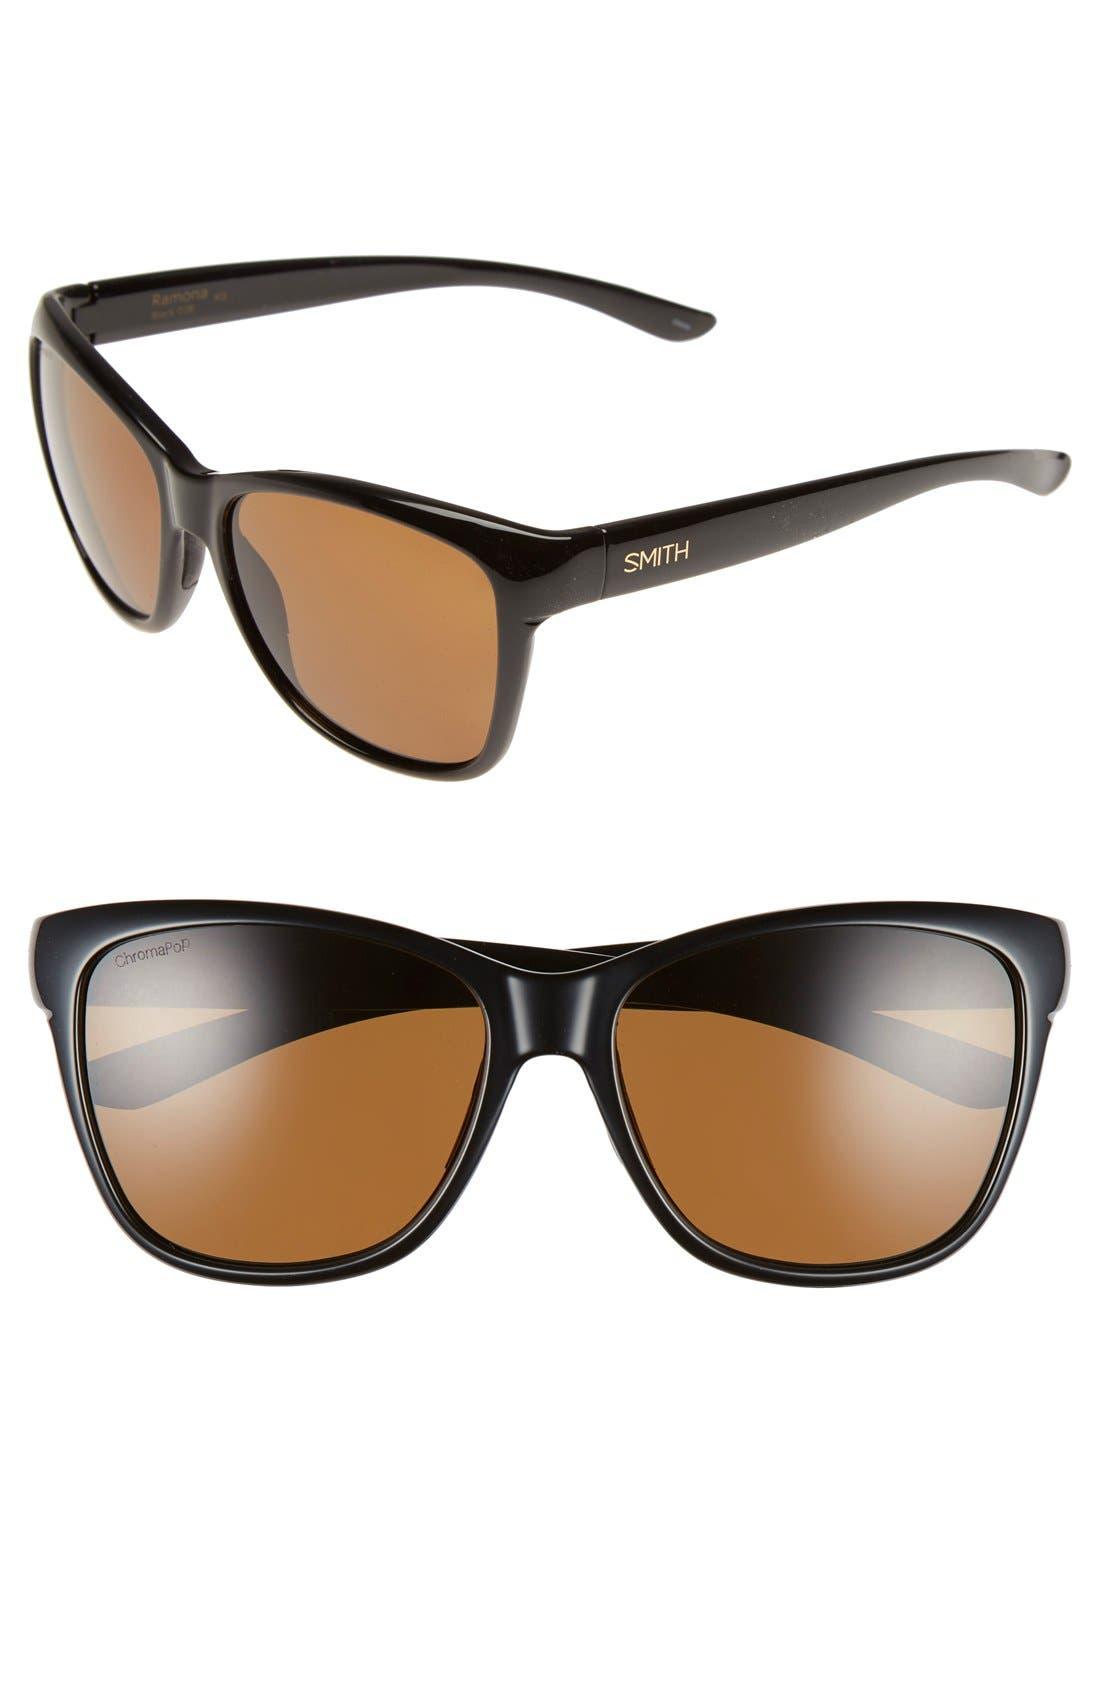 SMITH,                             'Ramona' 56mm ChromaPop Polarized Sunglasses,                             Main thumbnail 1, color,                             001